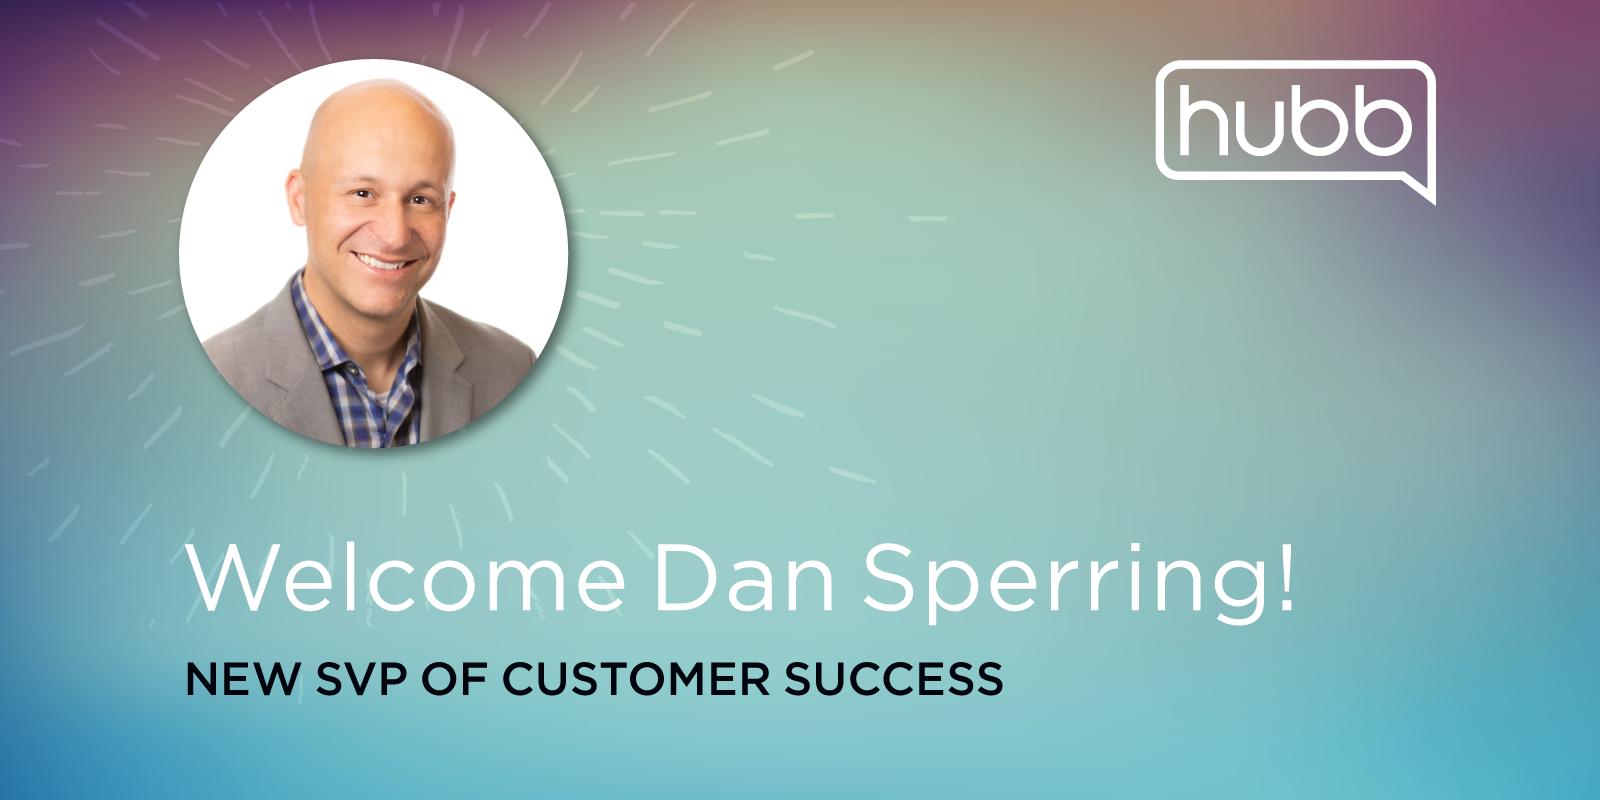 Welcome Dan Sperring, New SVP of Customer Success